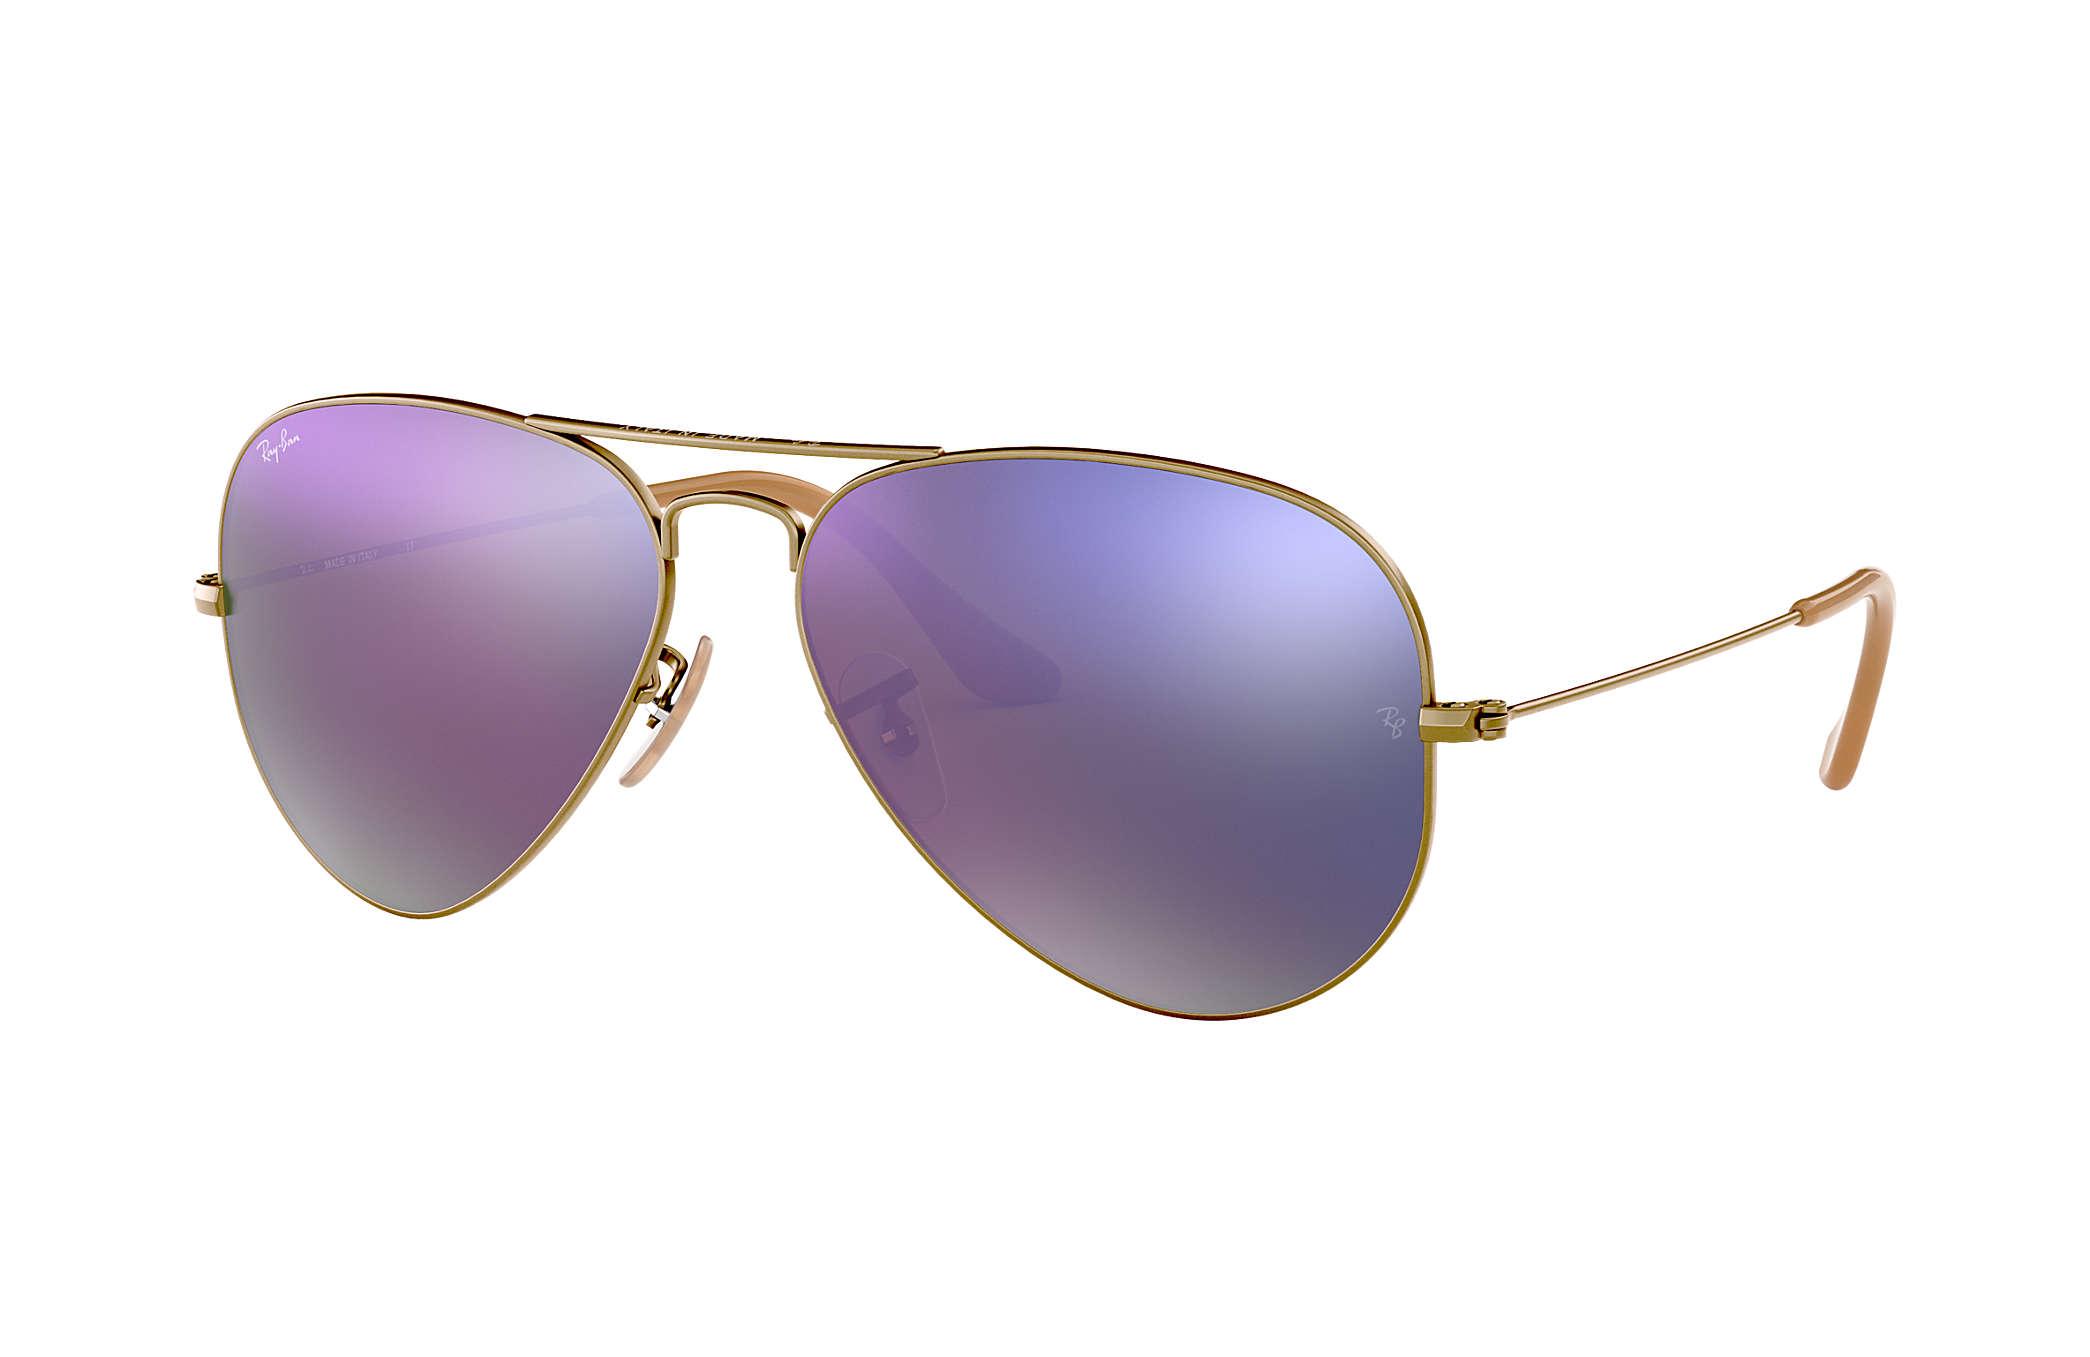 7293594543e0b Ray-Ban Aviator Flash Lenses RB3025 Bronze-Copper - Metal - Lilac ...